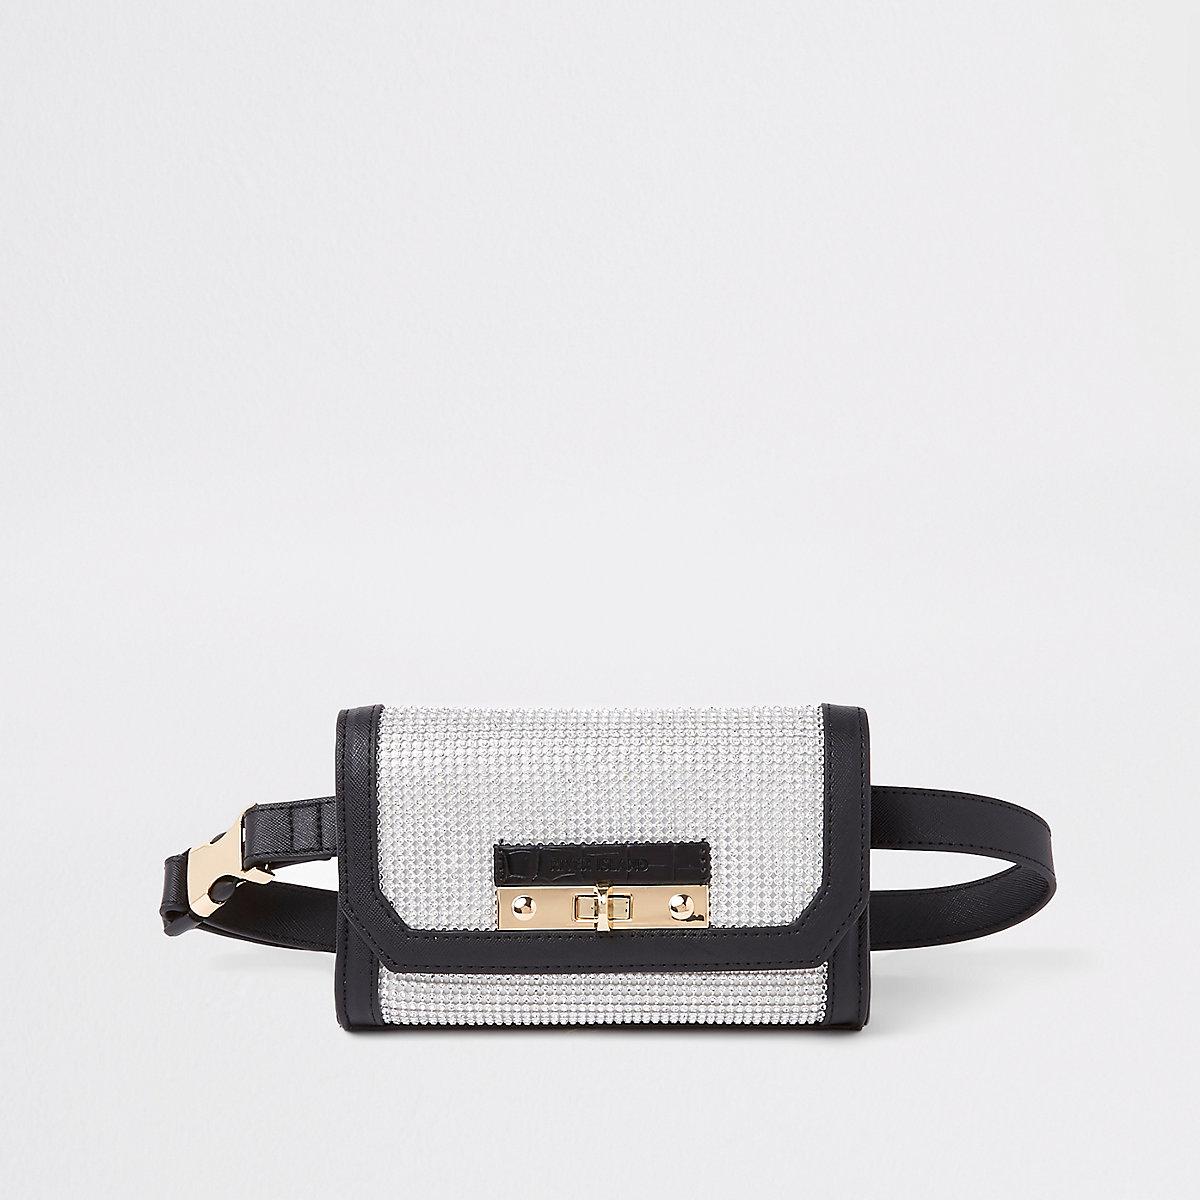 Black buckle belt bum bag